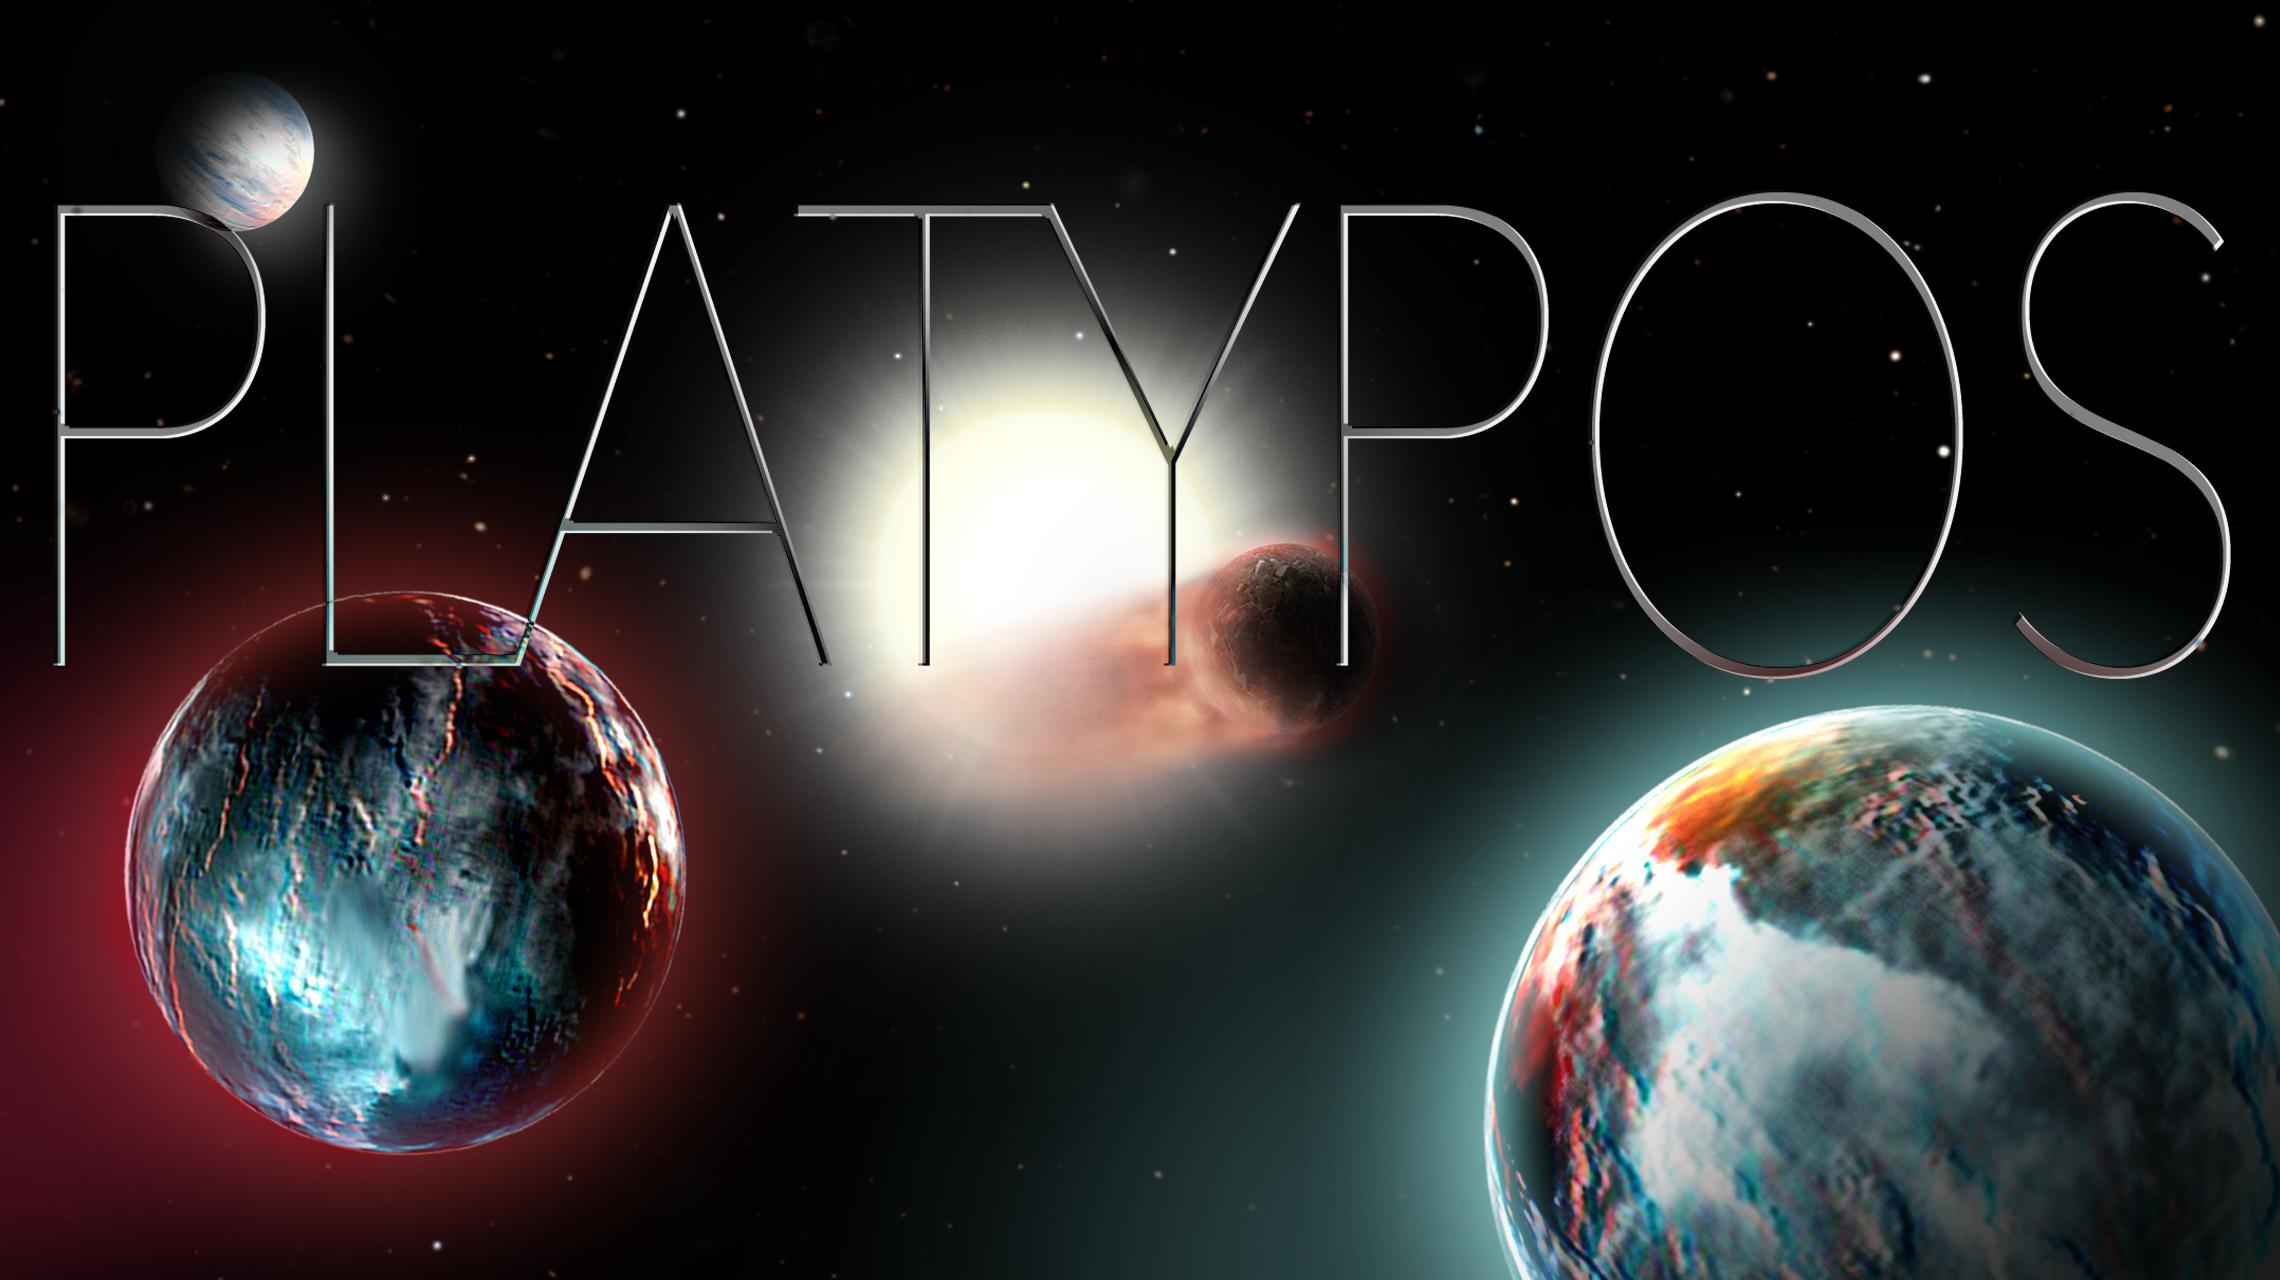 supplementary_files/an_Laura_Ketzer_PLATYPOS/platypos3.png